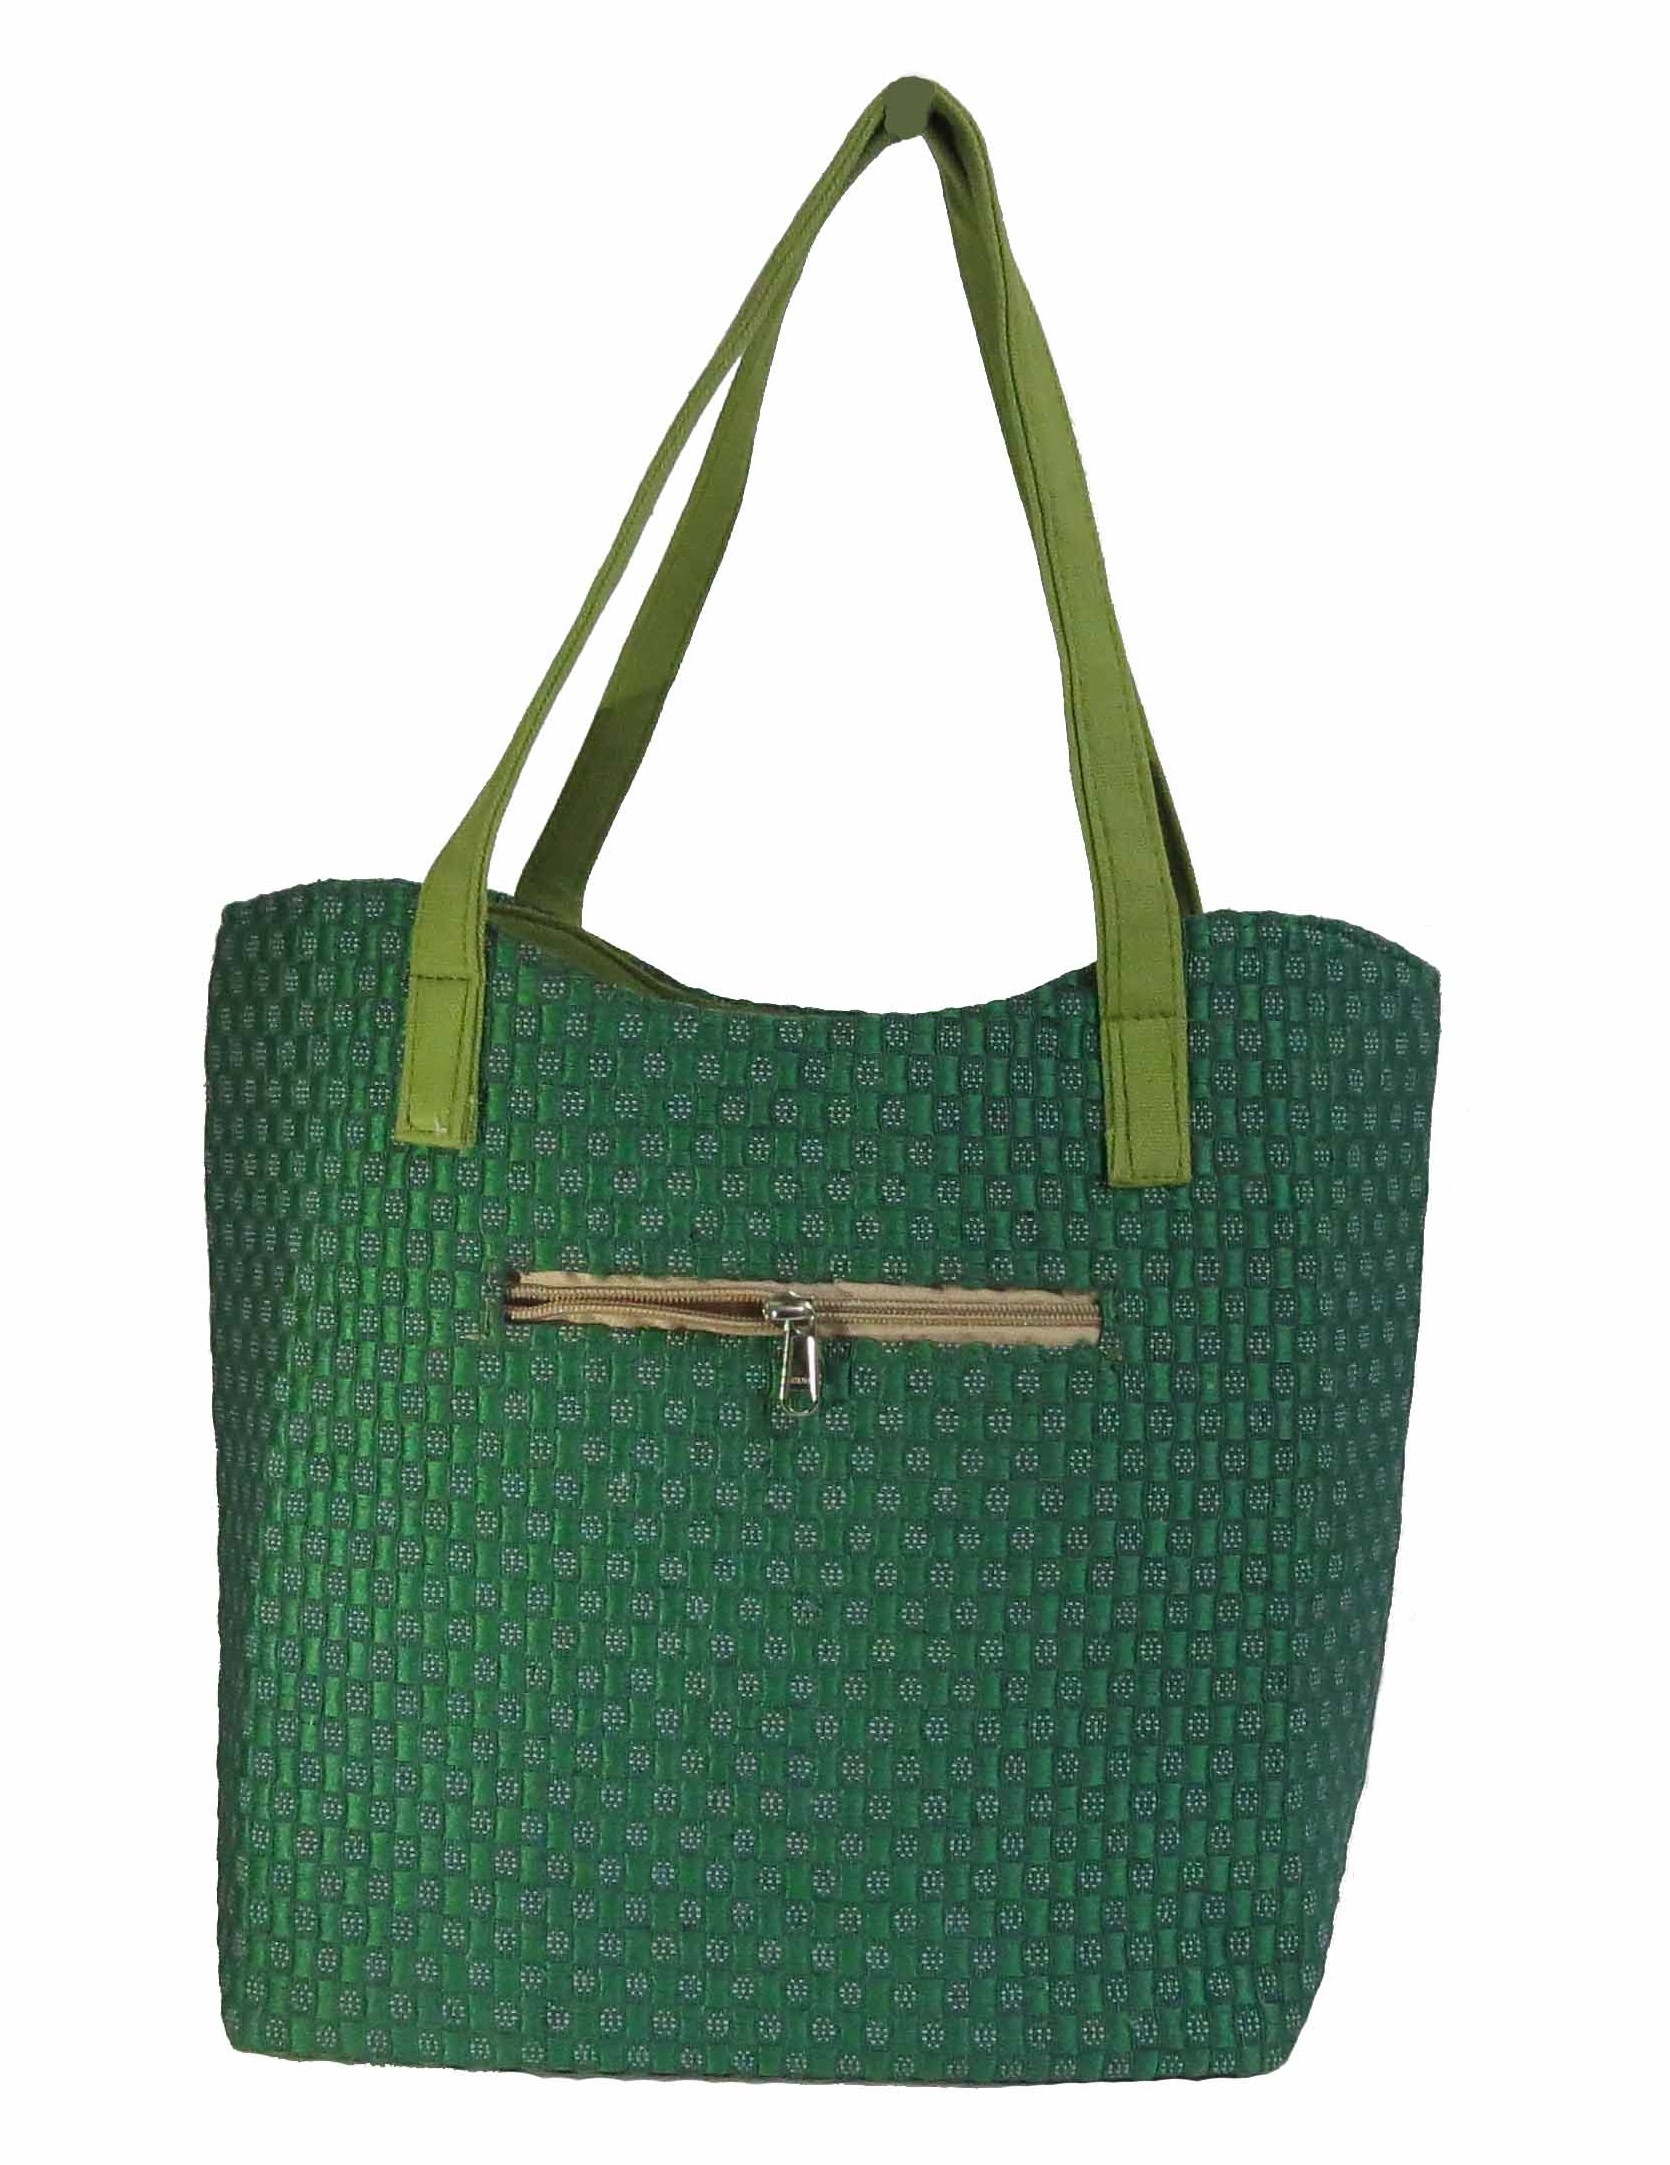 RubyRuby New Style Jute handbag, Designer jute hand bag